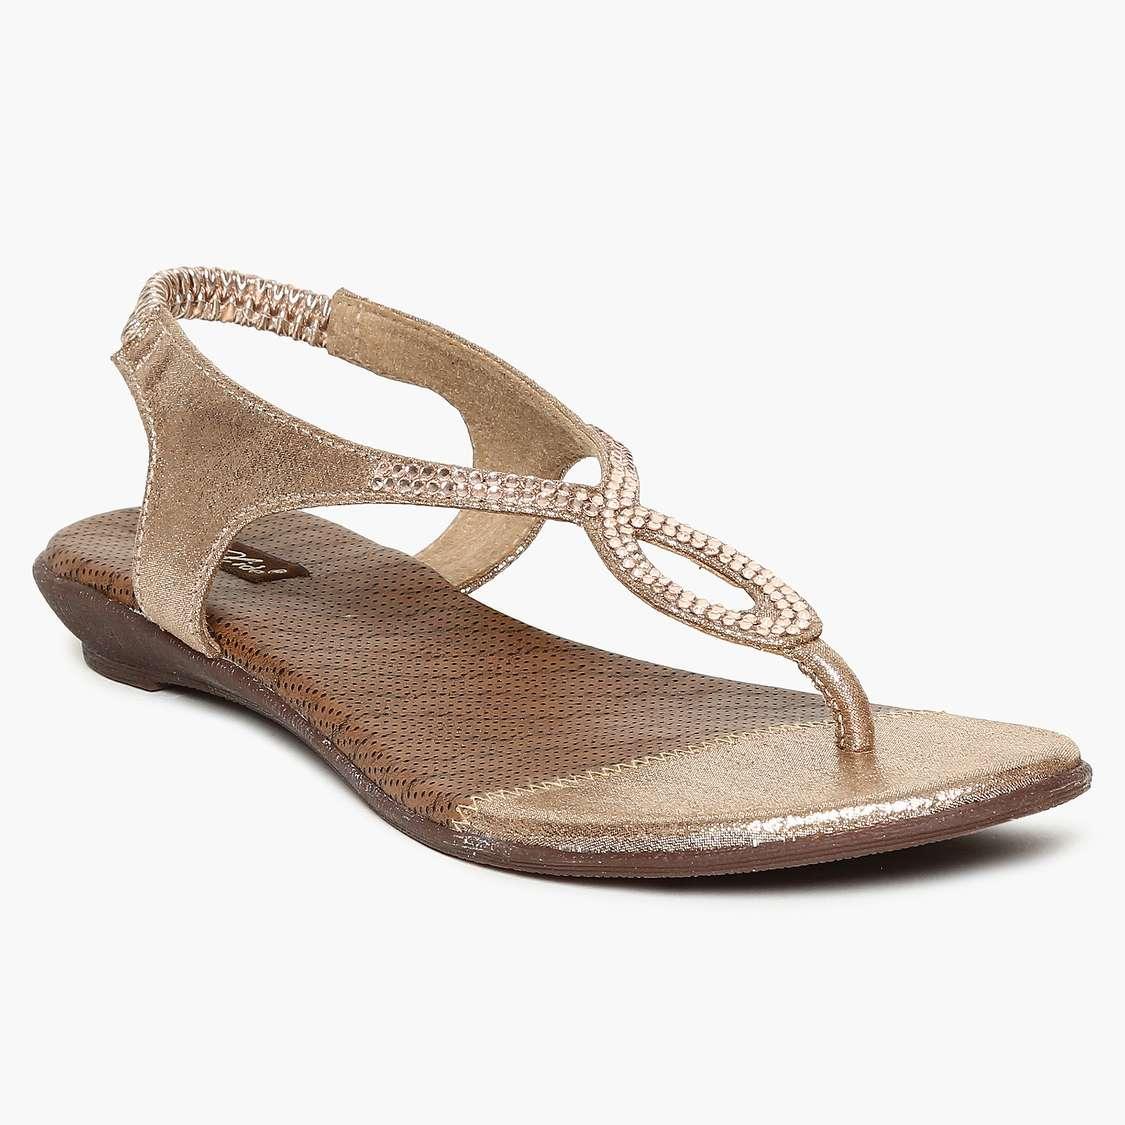 RAW HIDE Metallic Embellished Sling Back Strap Sandals types of shoes for women